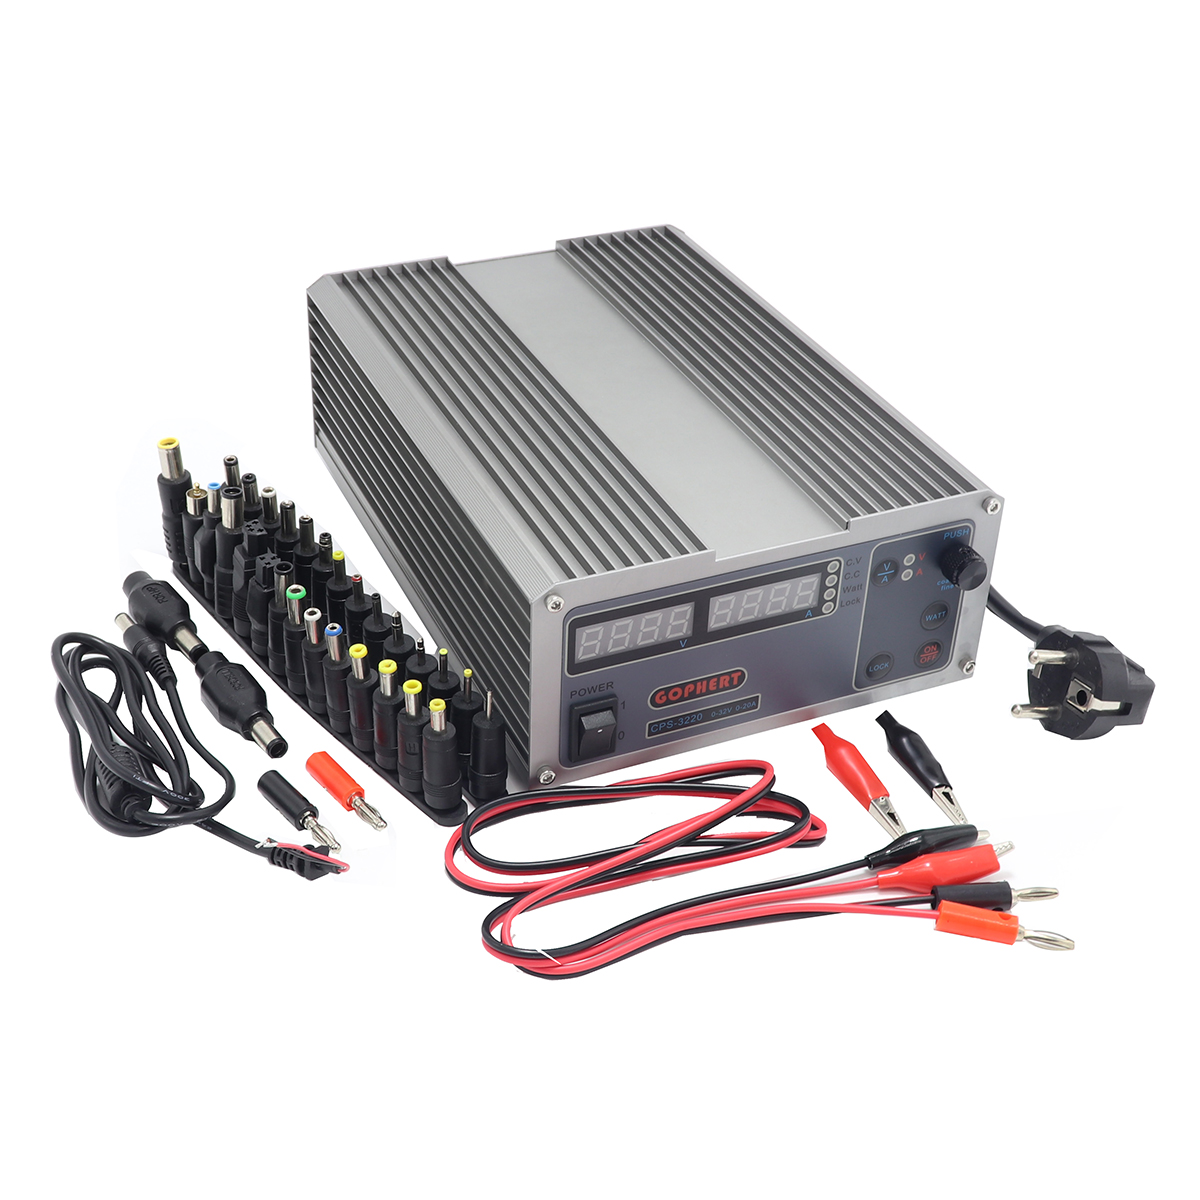 Mini cps 3220 DC Power Supply 37pcs head Banana clip wire EU UK US adapter OVP